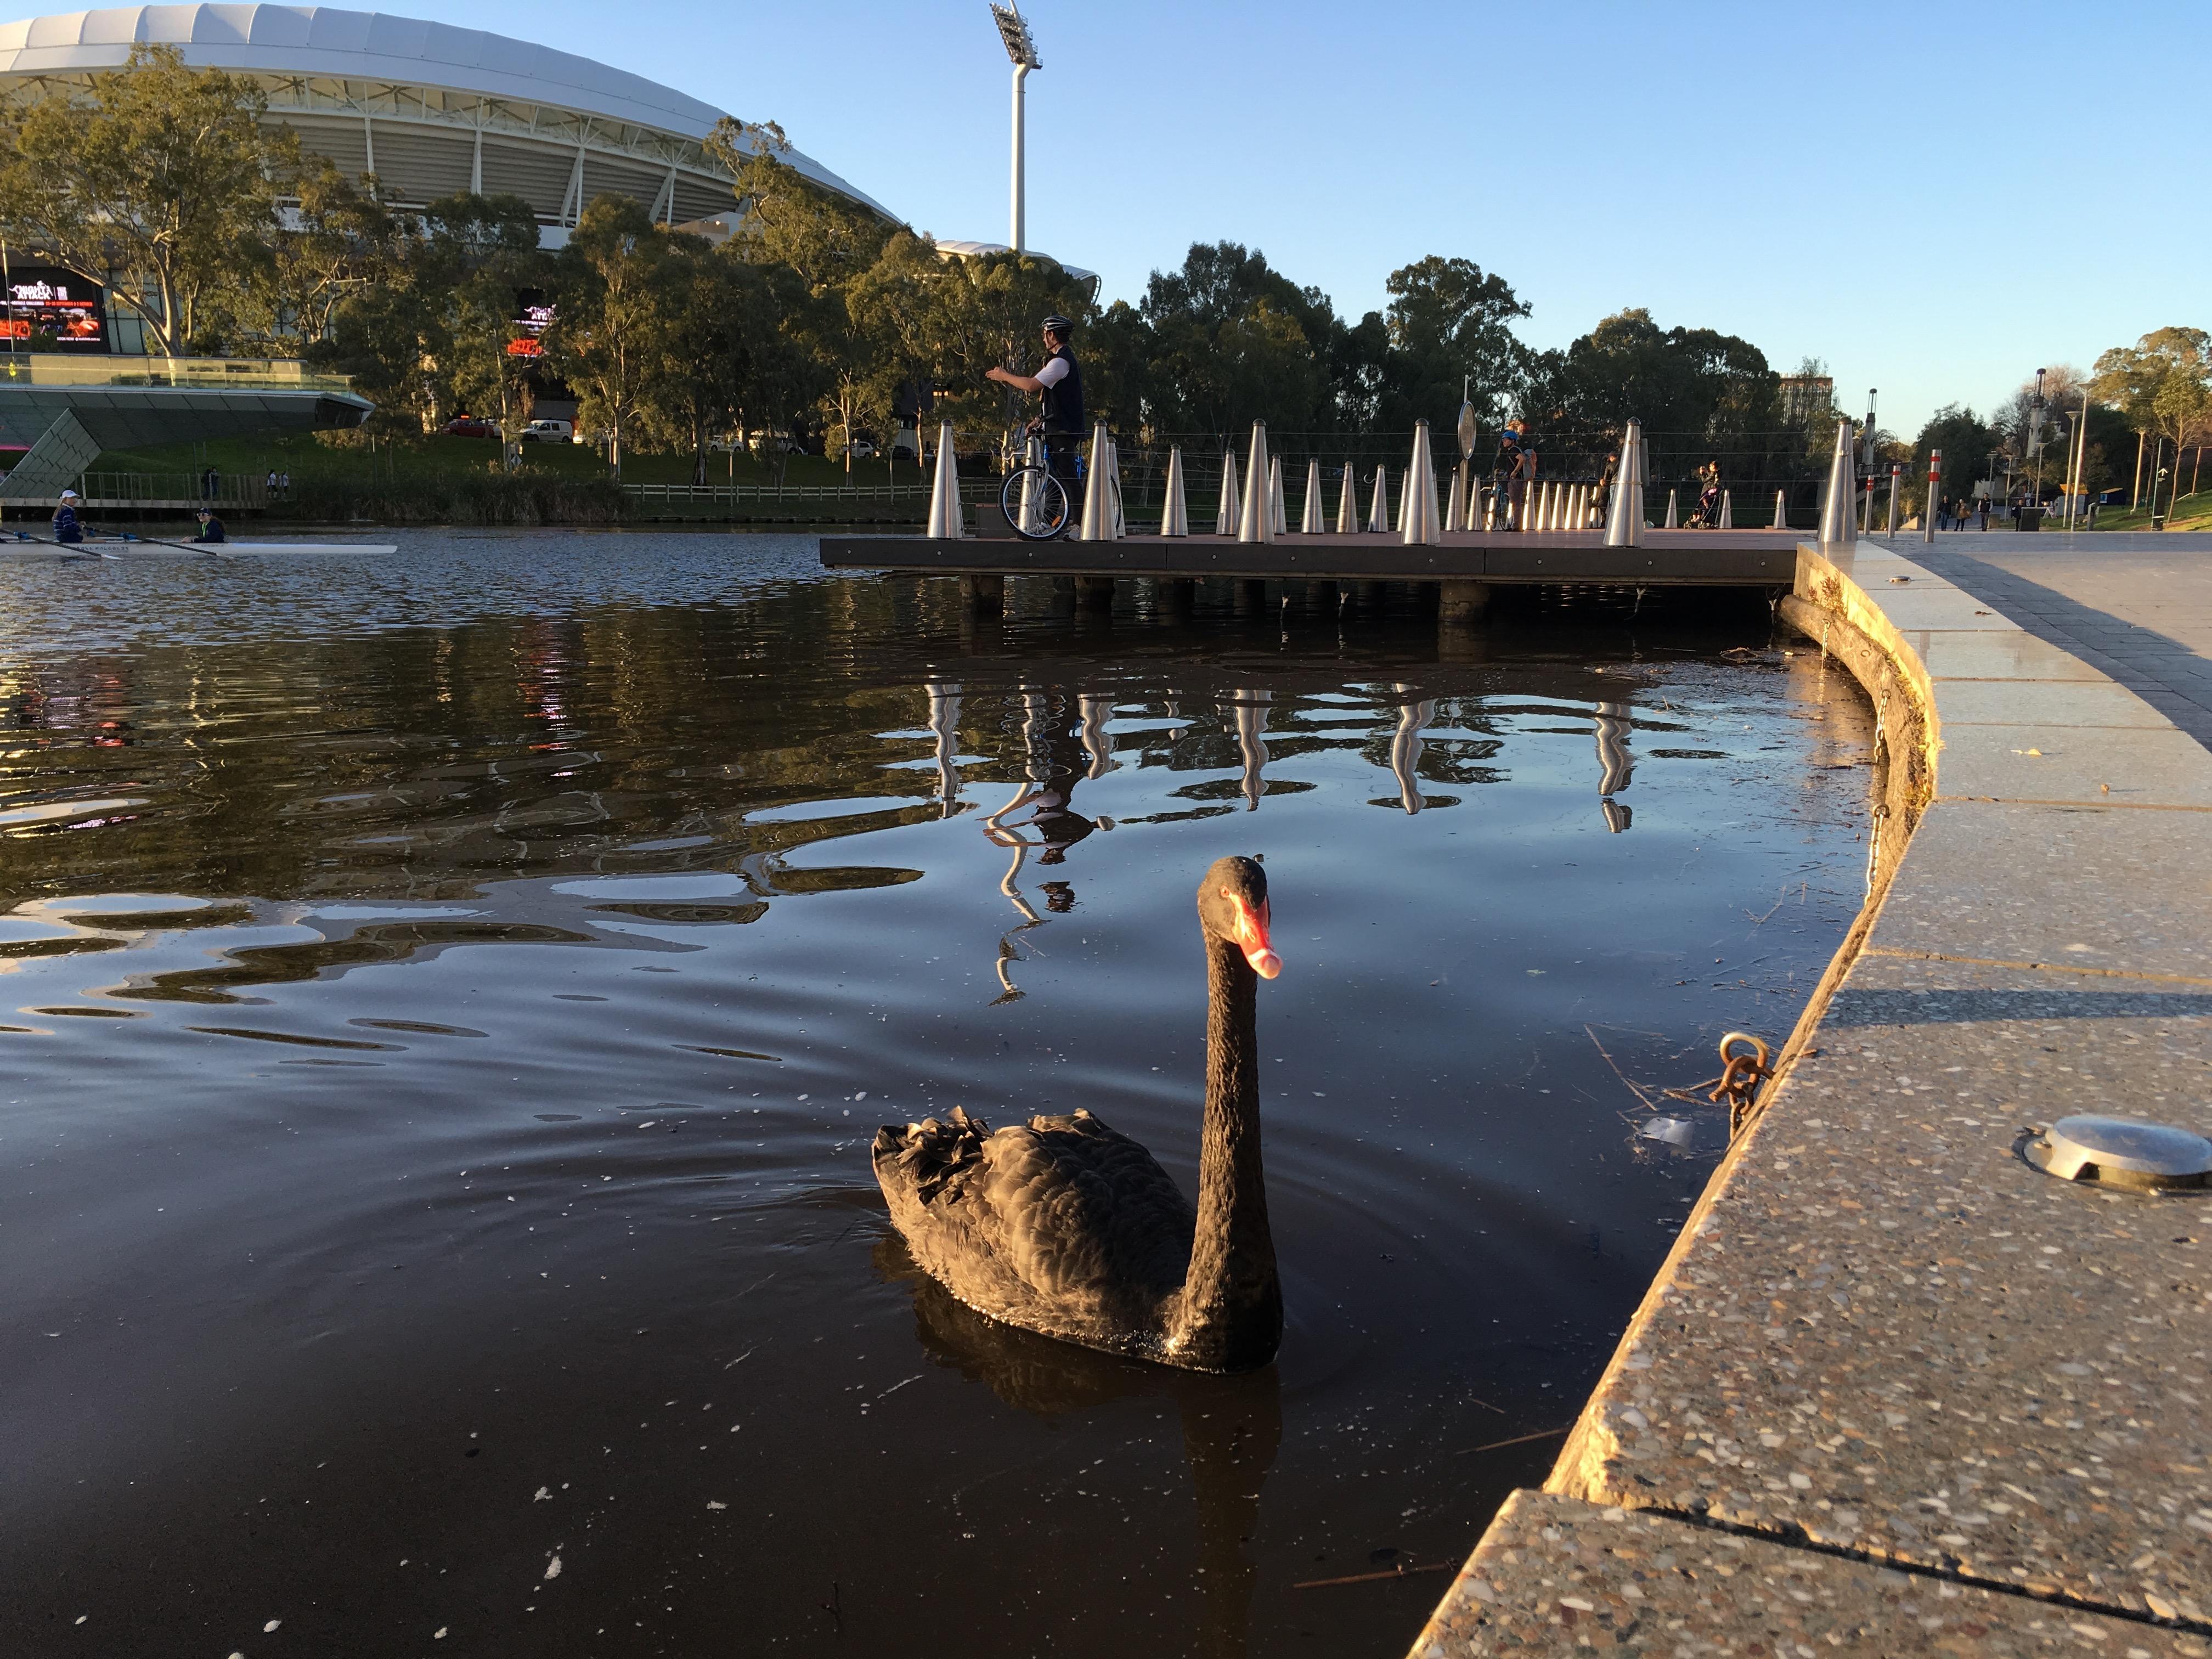 Poze Negru Lebădă Adelaide Oval Sud Australia